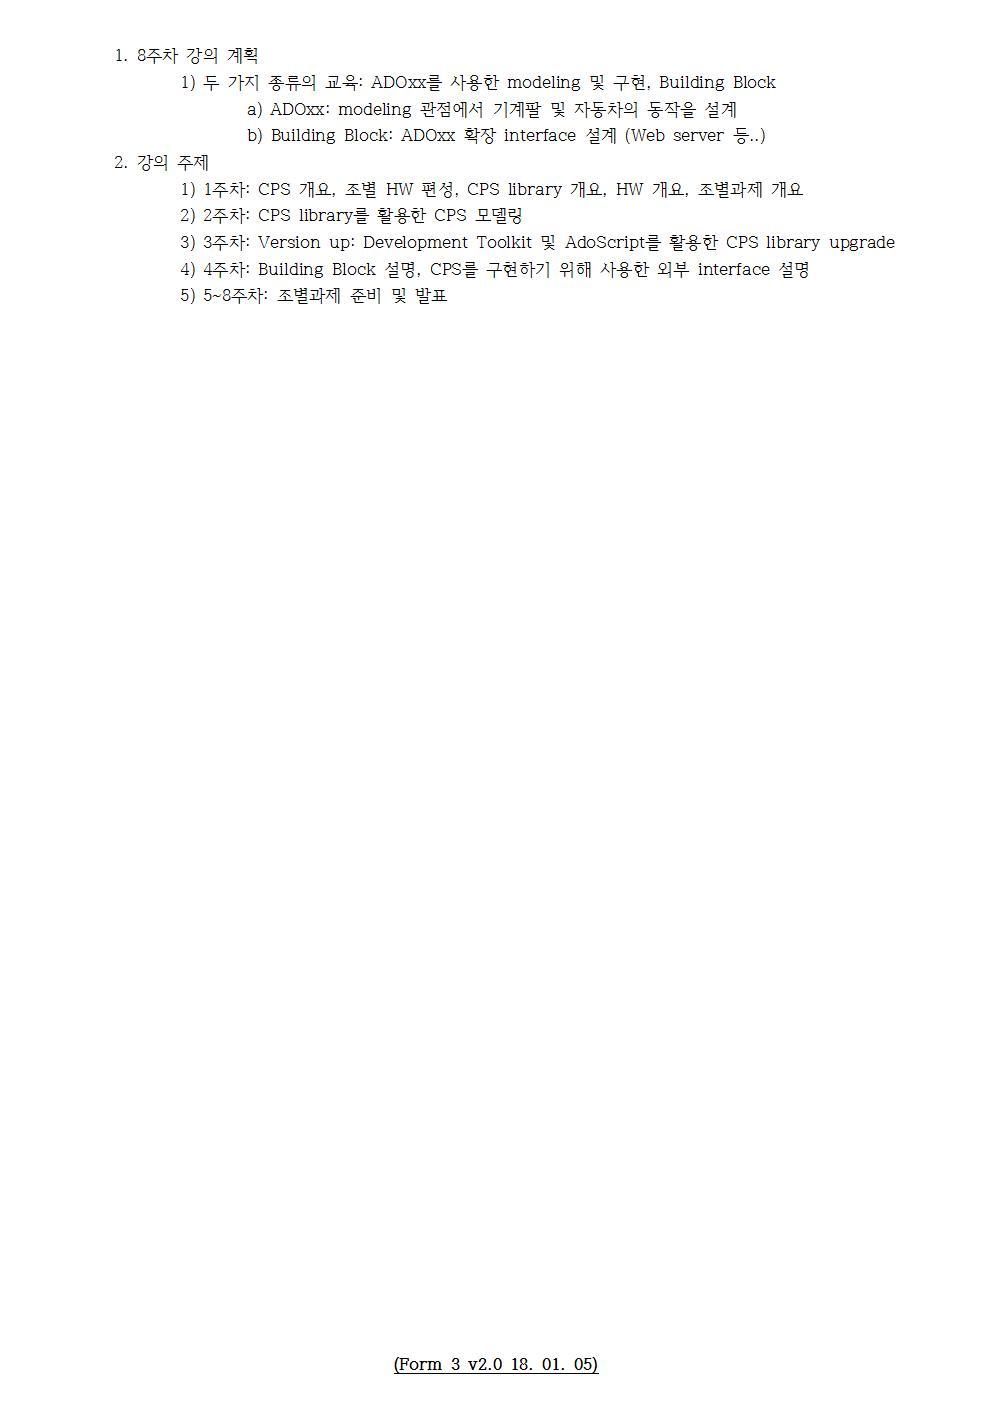 D-[18-040-RC-09]-[SWD-ADOxx Project]-[2018-06-21][SH]002.jpg